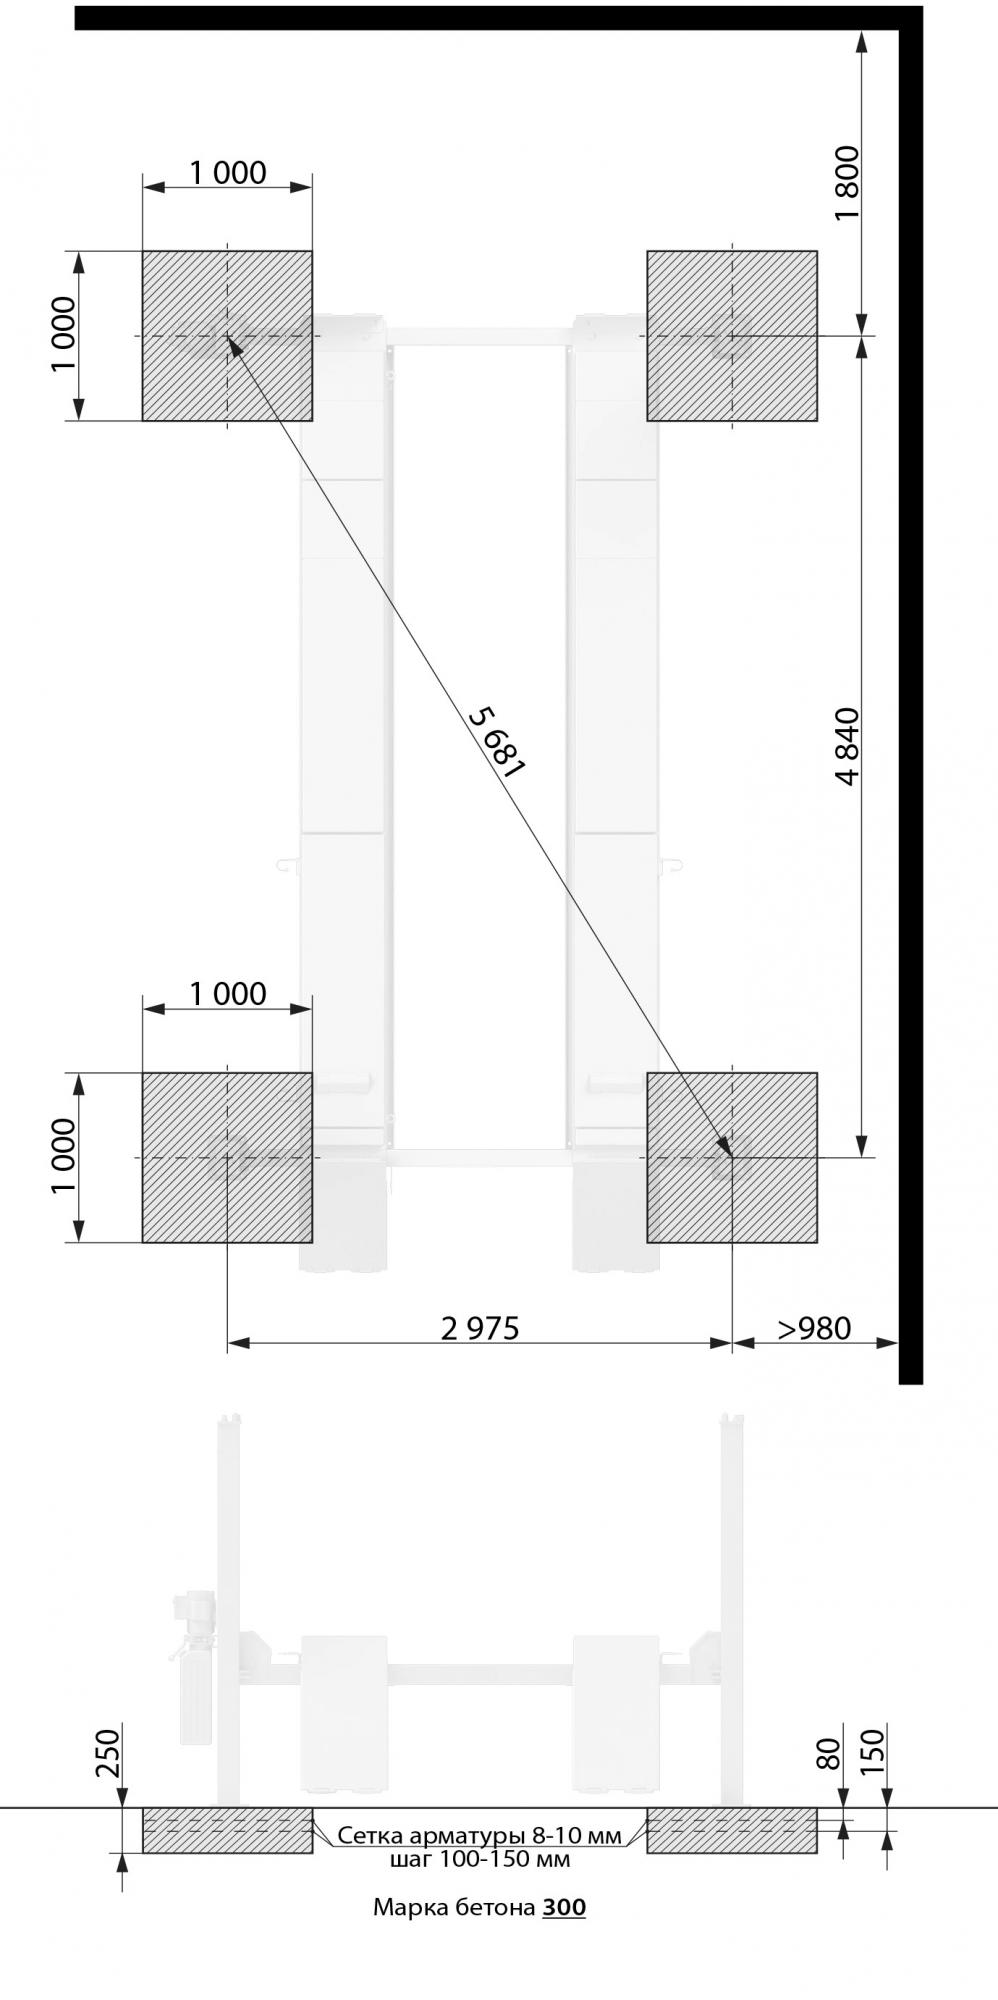 Sivik-ПГА-5000-4 фундамент